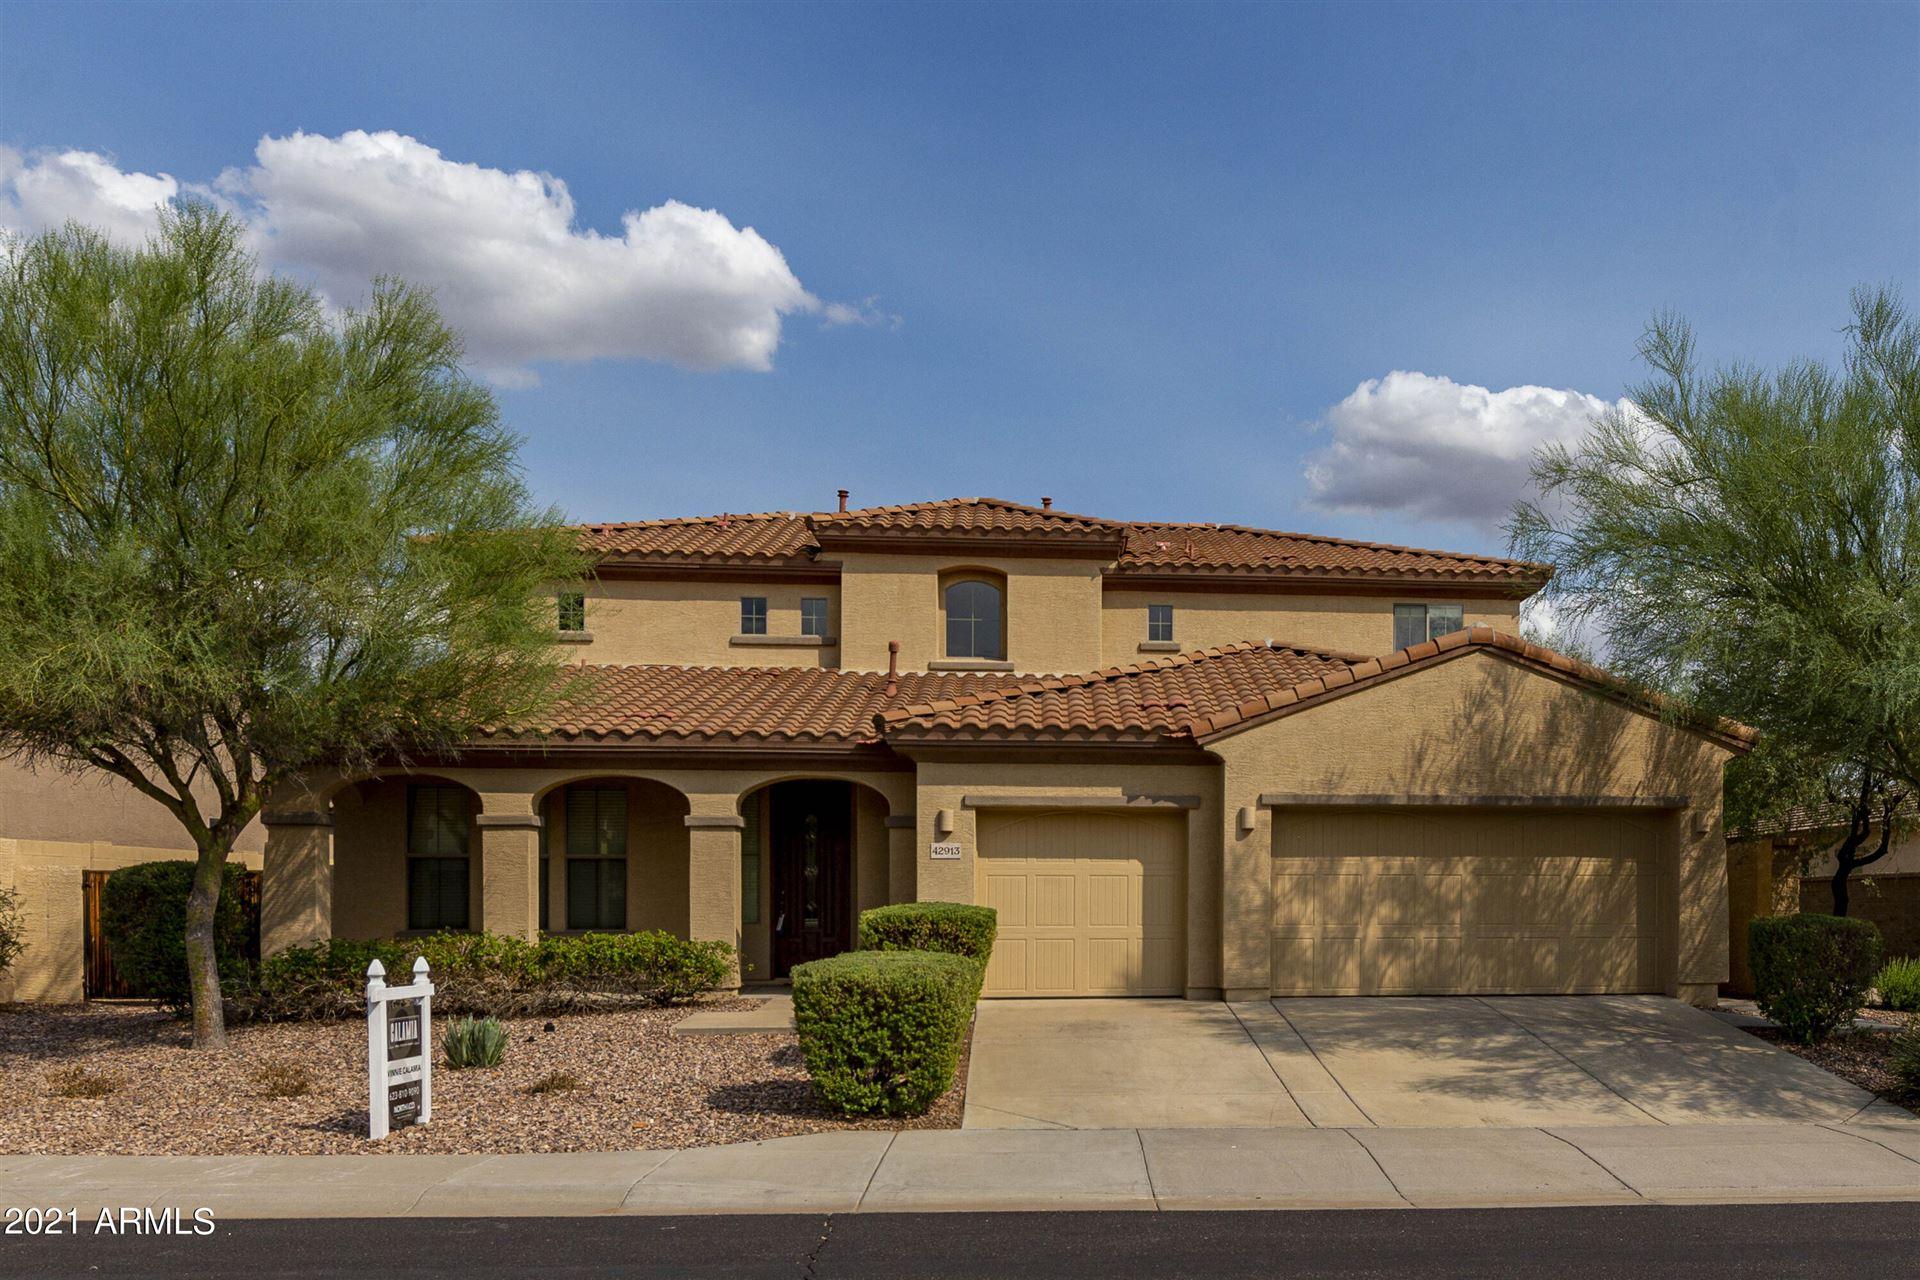 Photo of 42913 N 46TH Avenue, New River, AZ 85087 (MLS # 6300500)